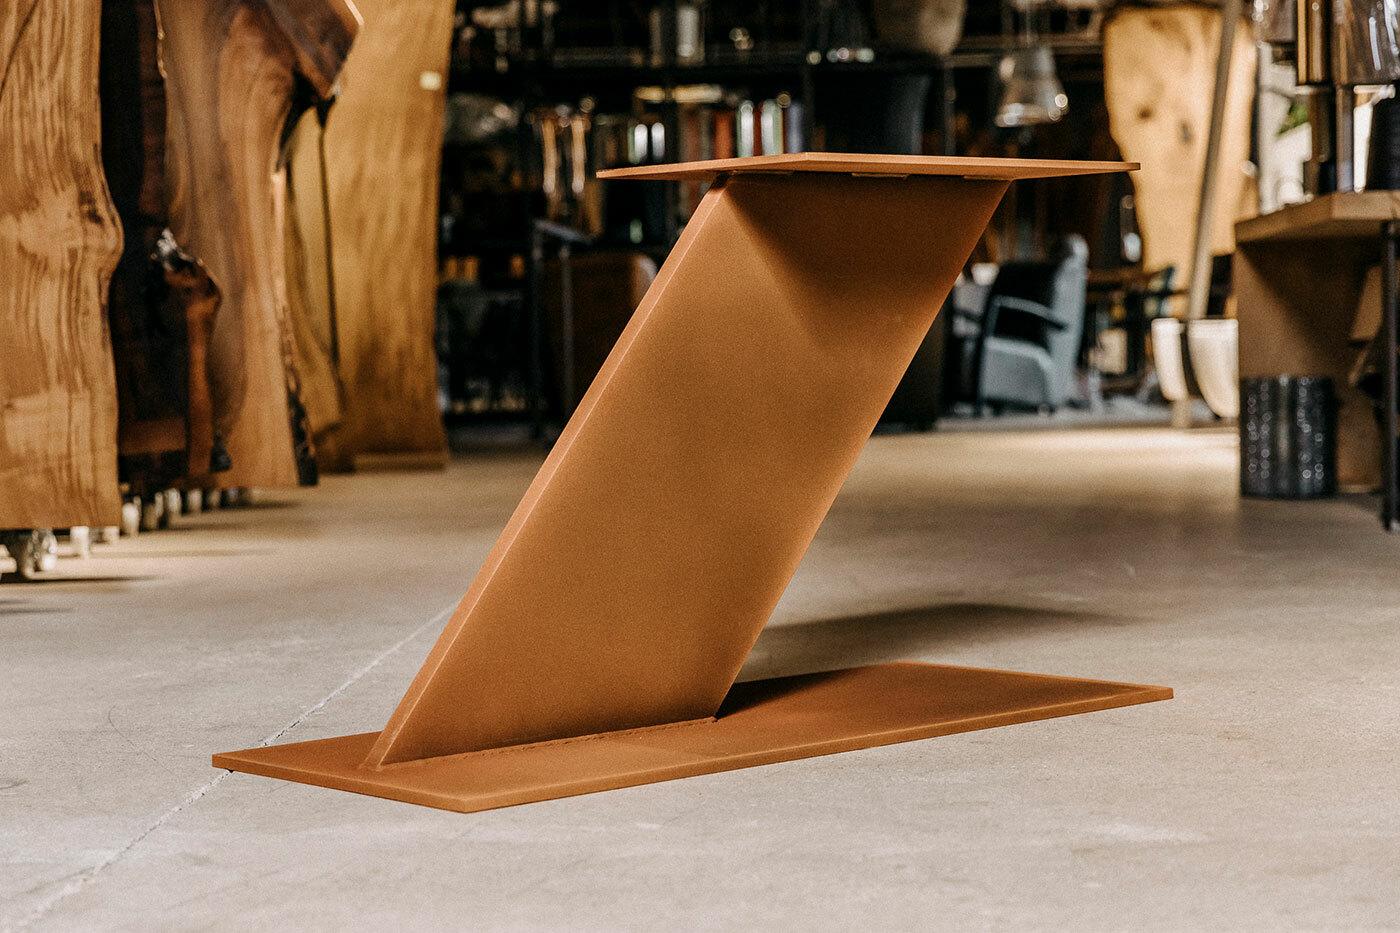 Metall Mittelfuß Tischgestell schräg Jayden Rust